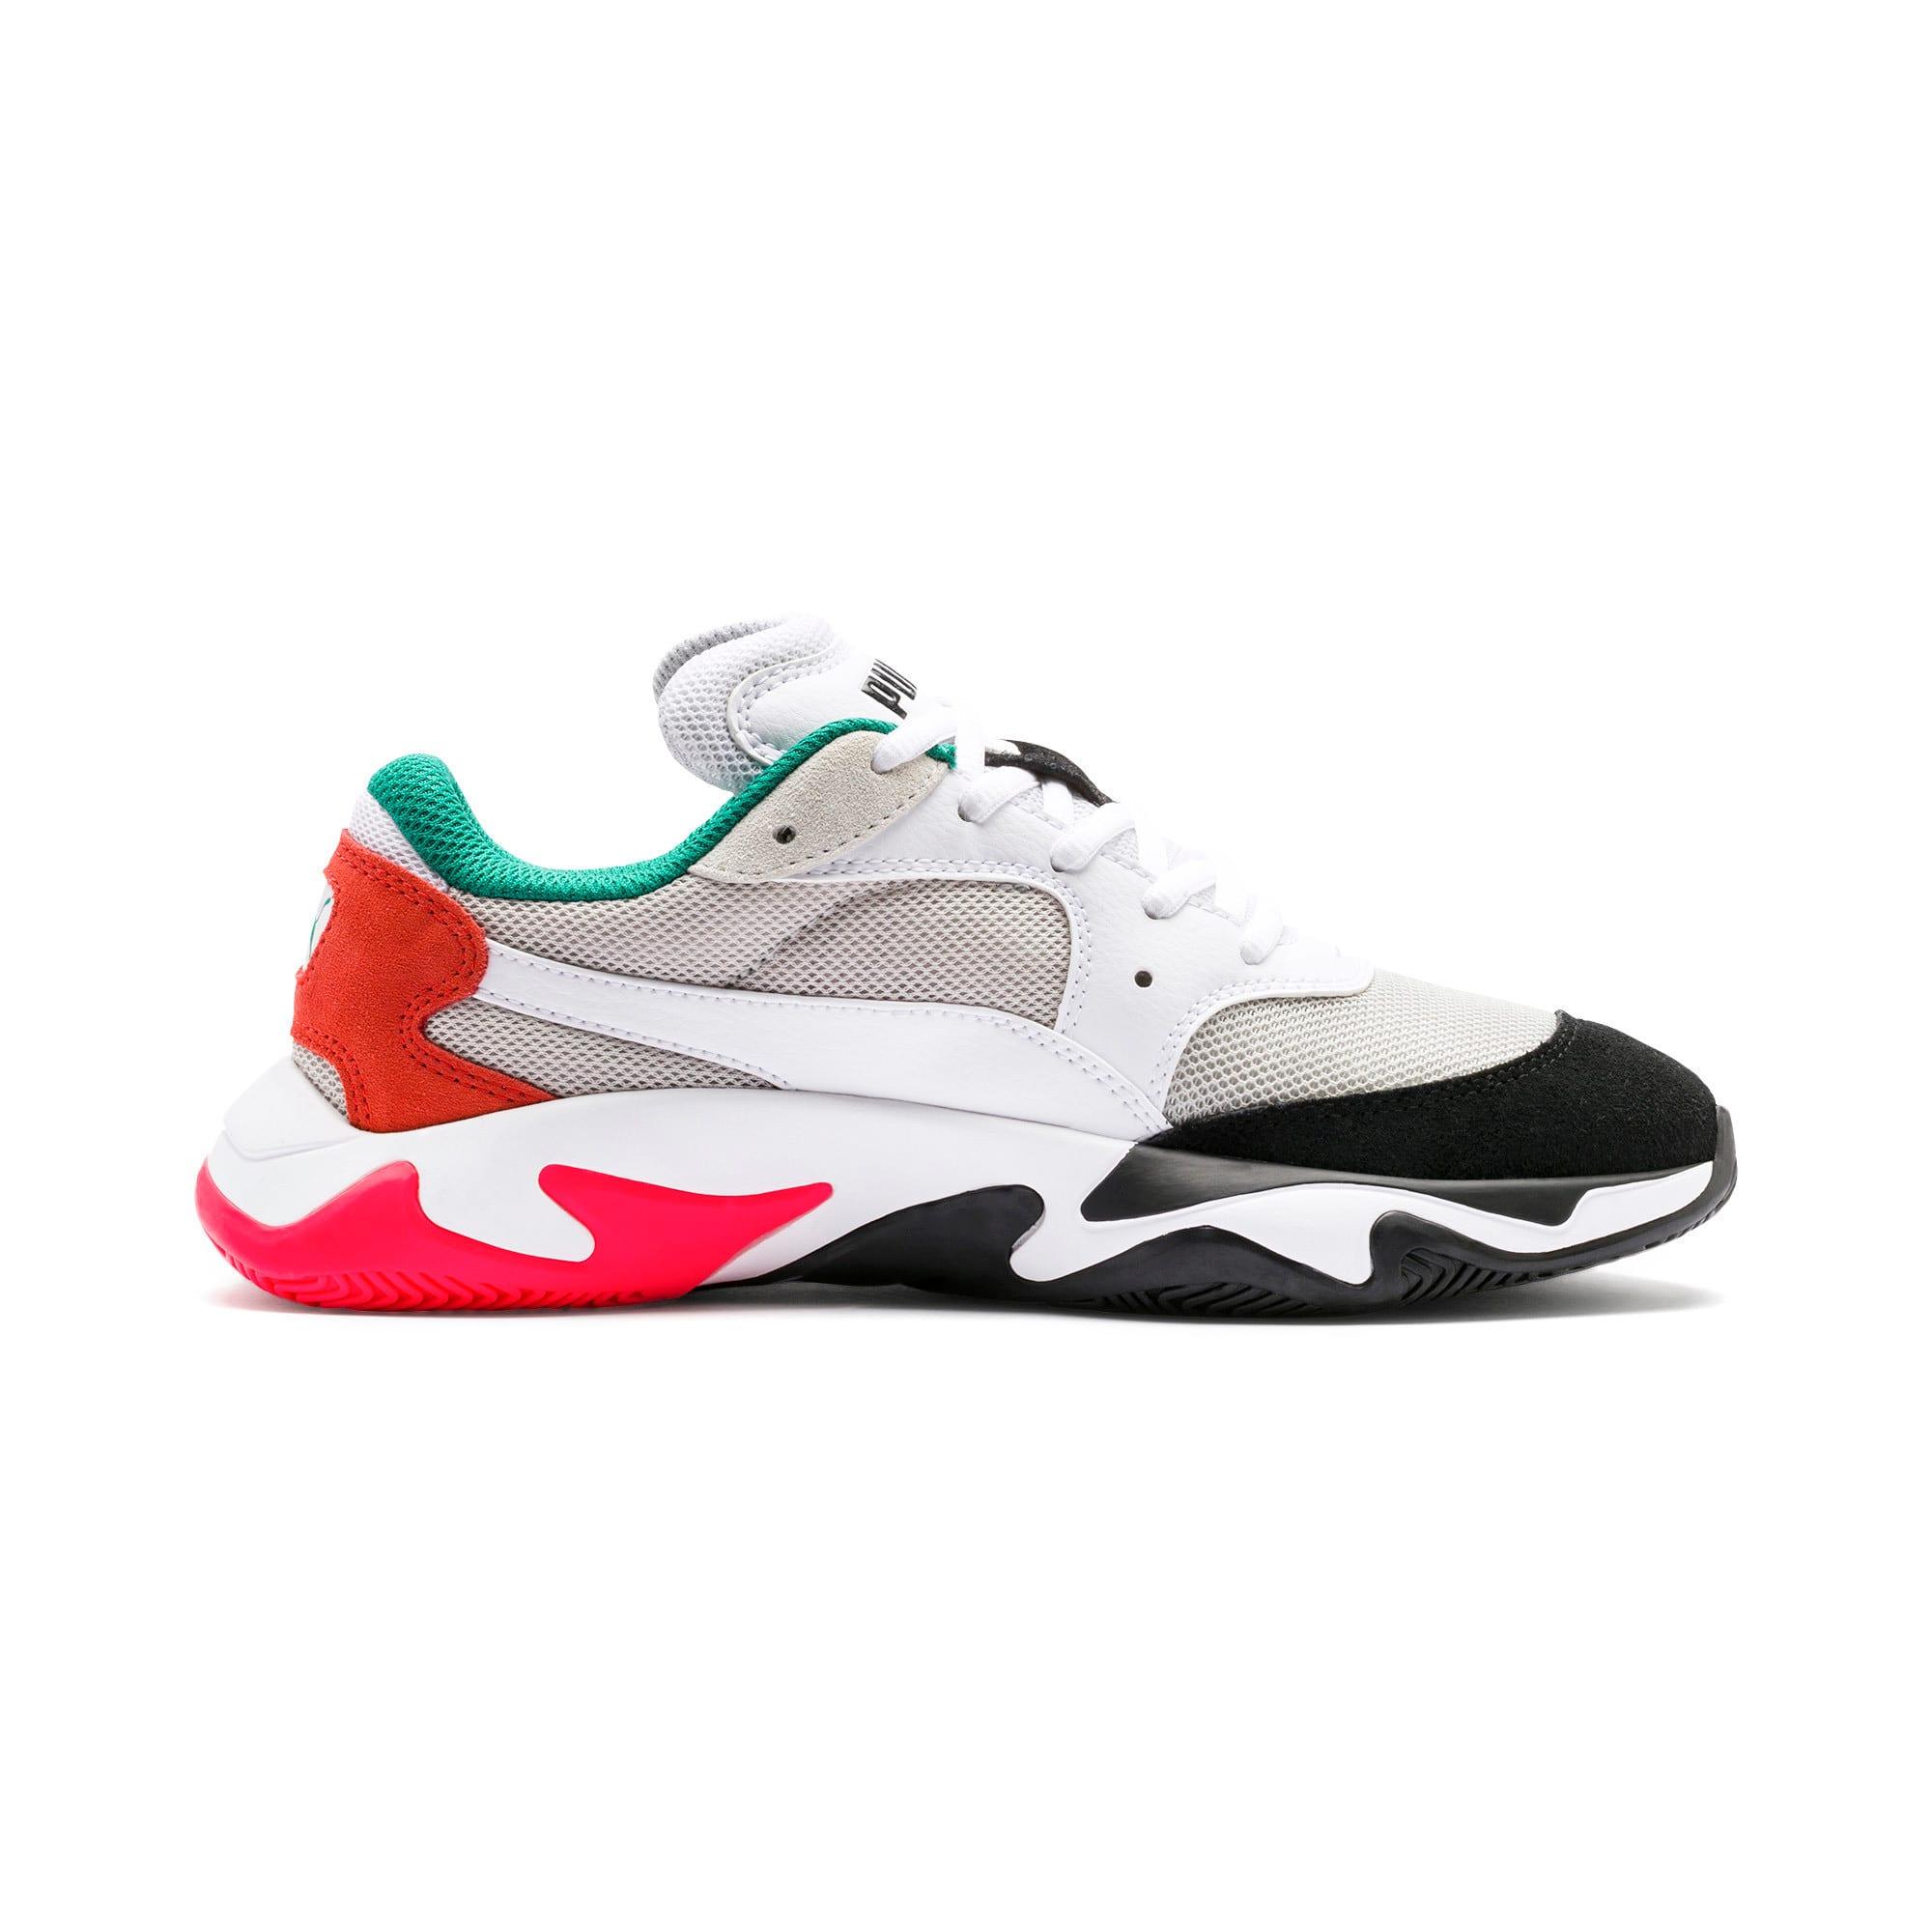 Thumbnail 8 of Storm Adrenaline Sneaker, Puma Black-Gray Violet, medium